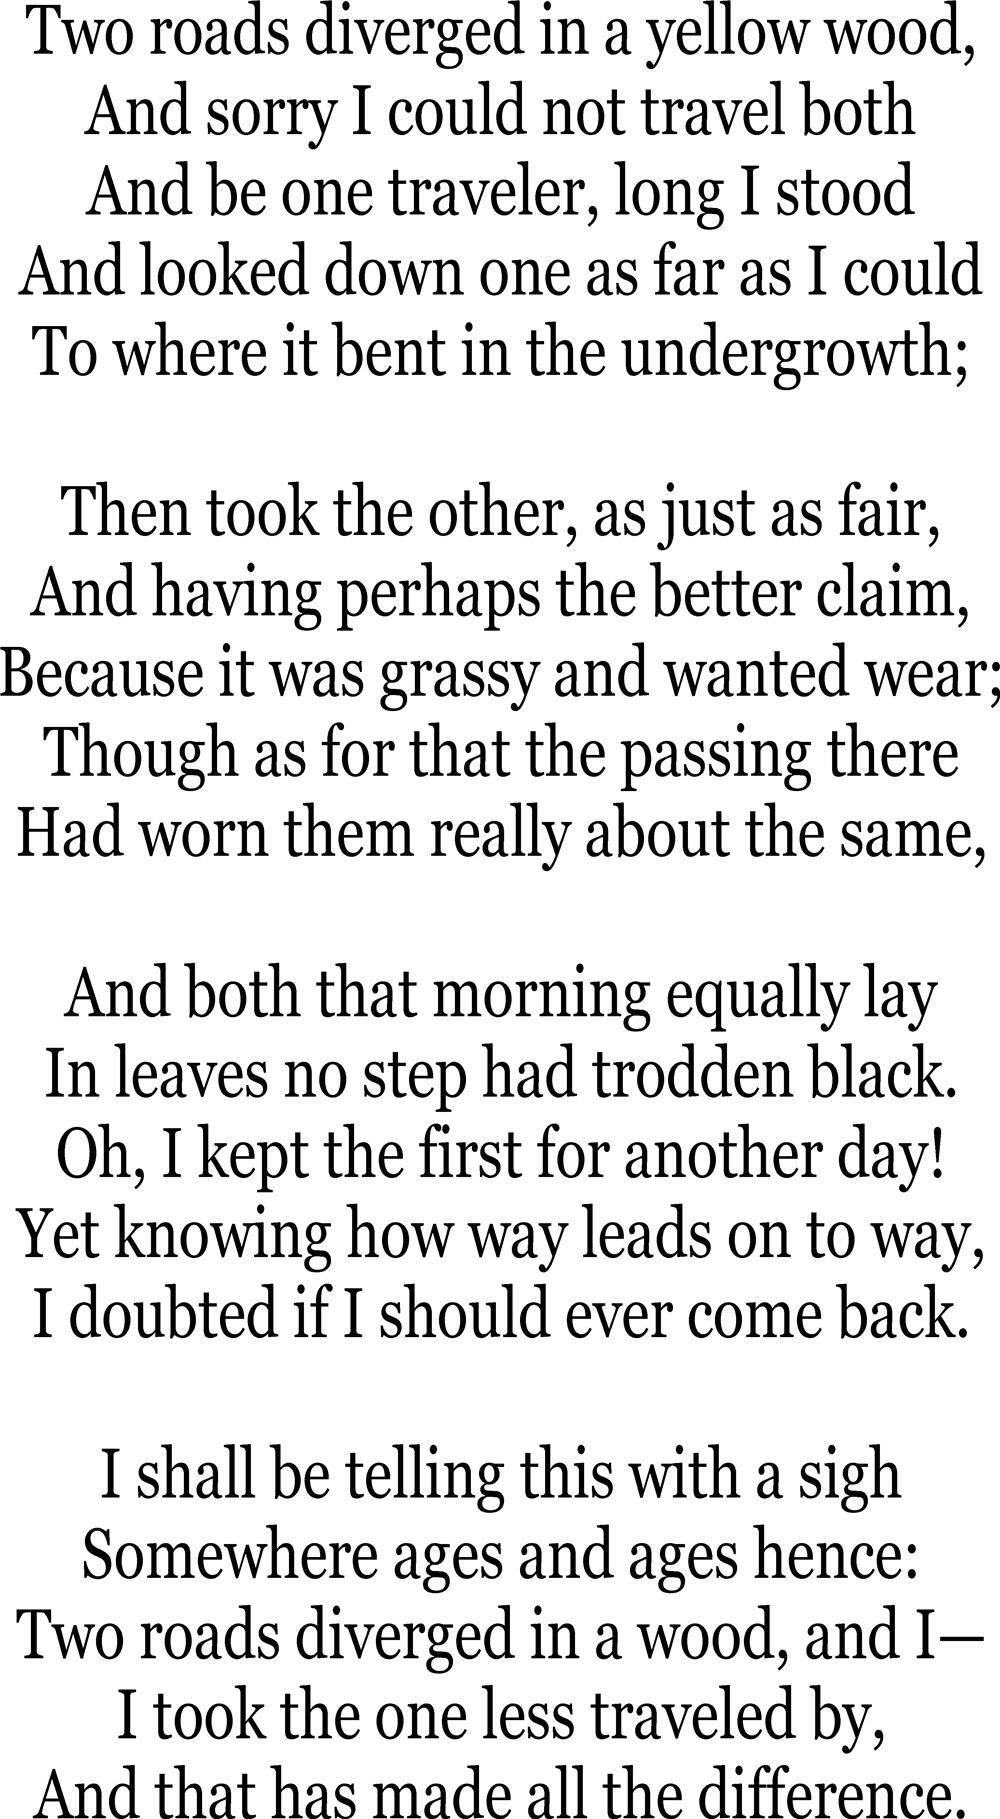 The Road Not Taken By Robert Frost Http Www Annabelchaffer Com Poem Poetry Ode To Autumn John Keat Summary